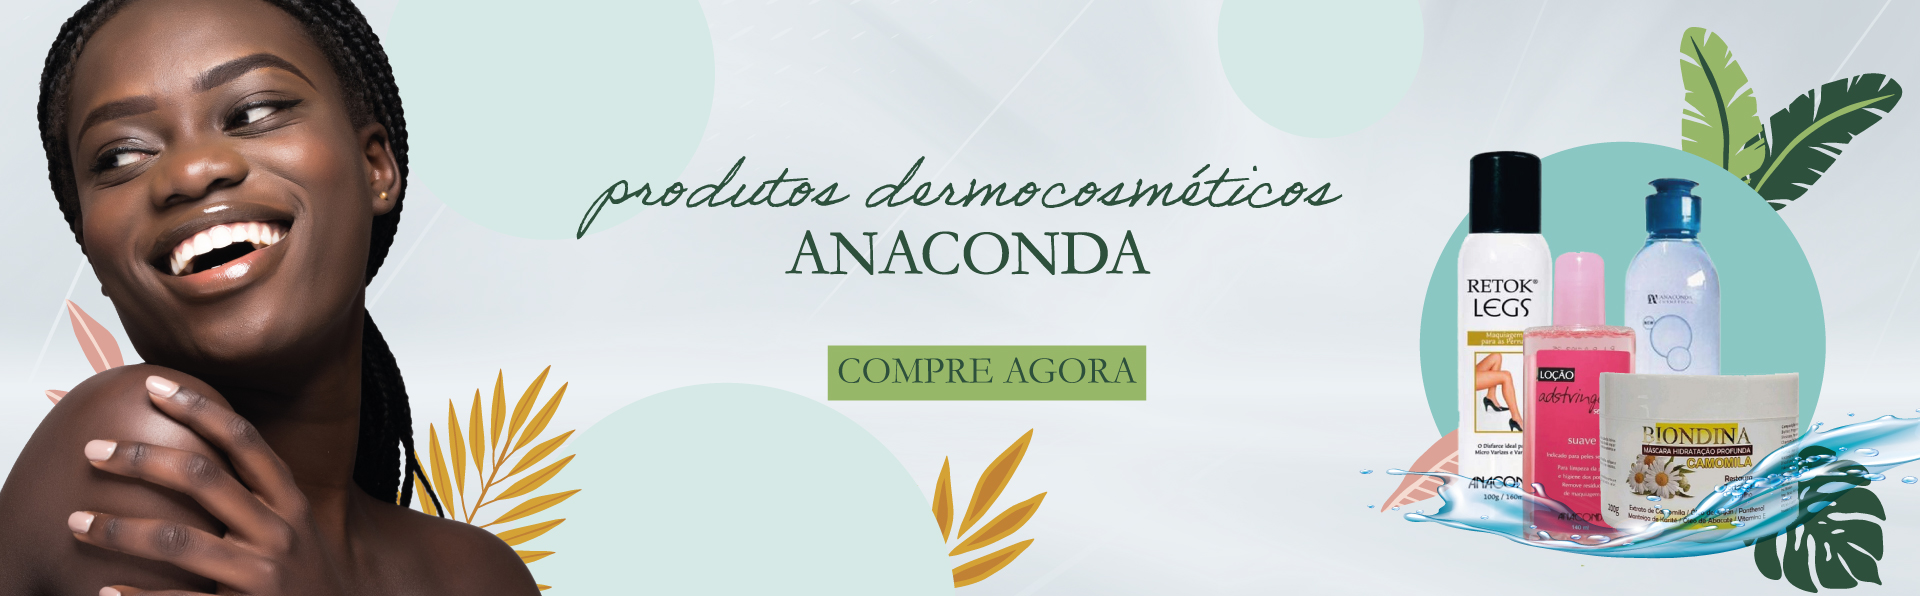 BANNER 8 -Anaconda